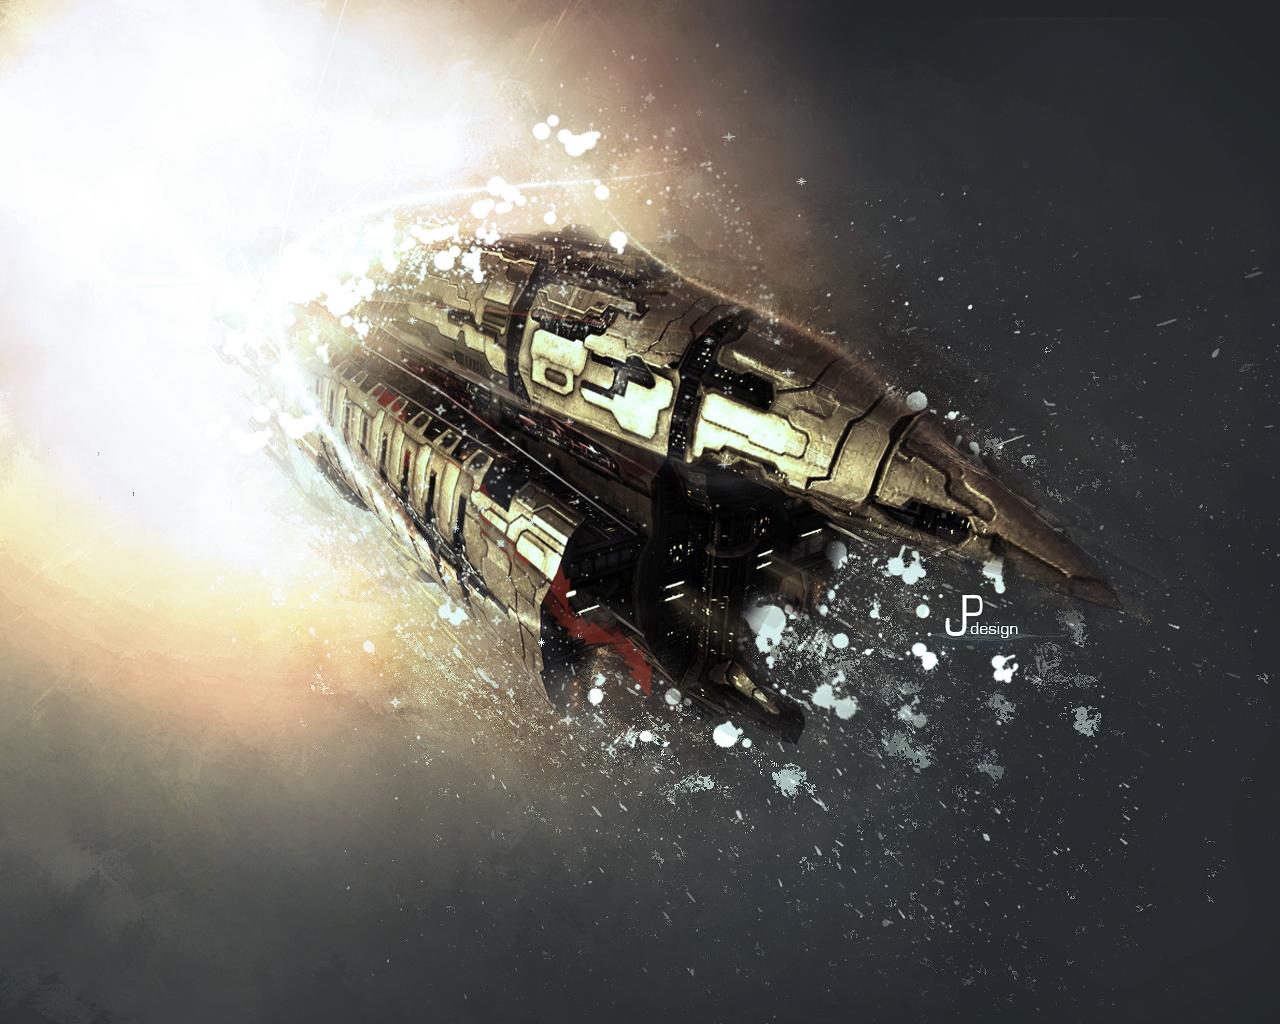 Final frontier 2 the galactic war starting - Final space wallpaper ...